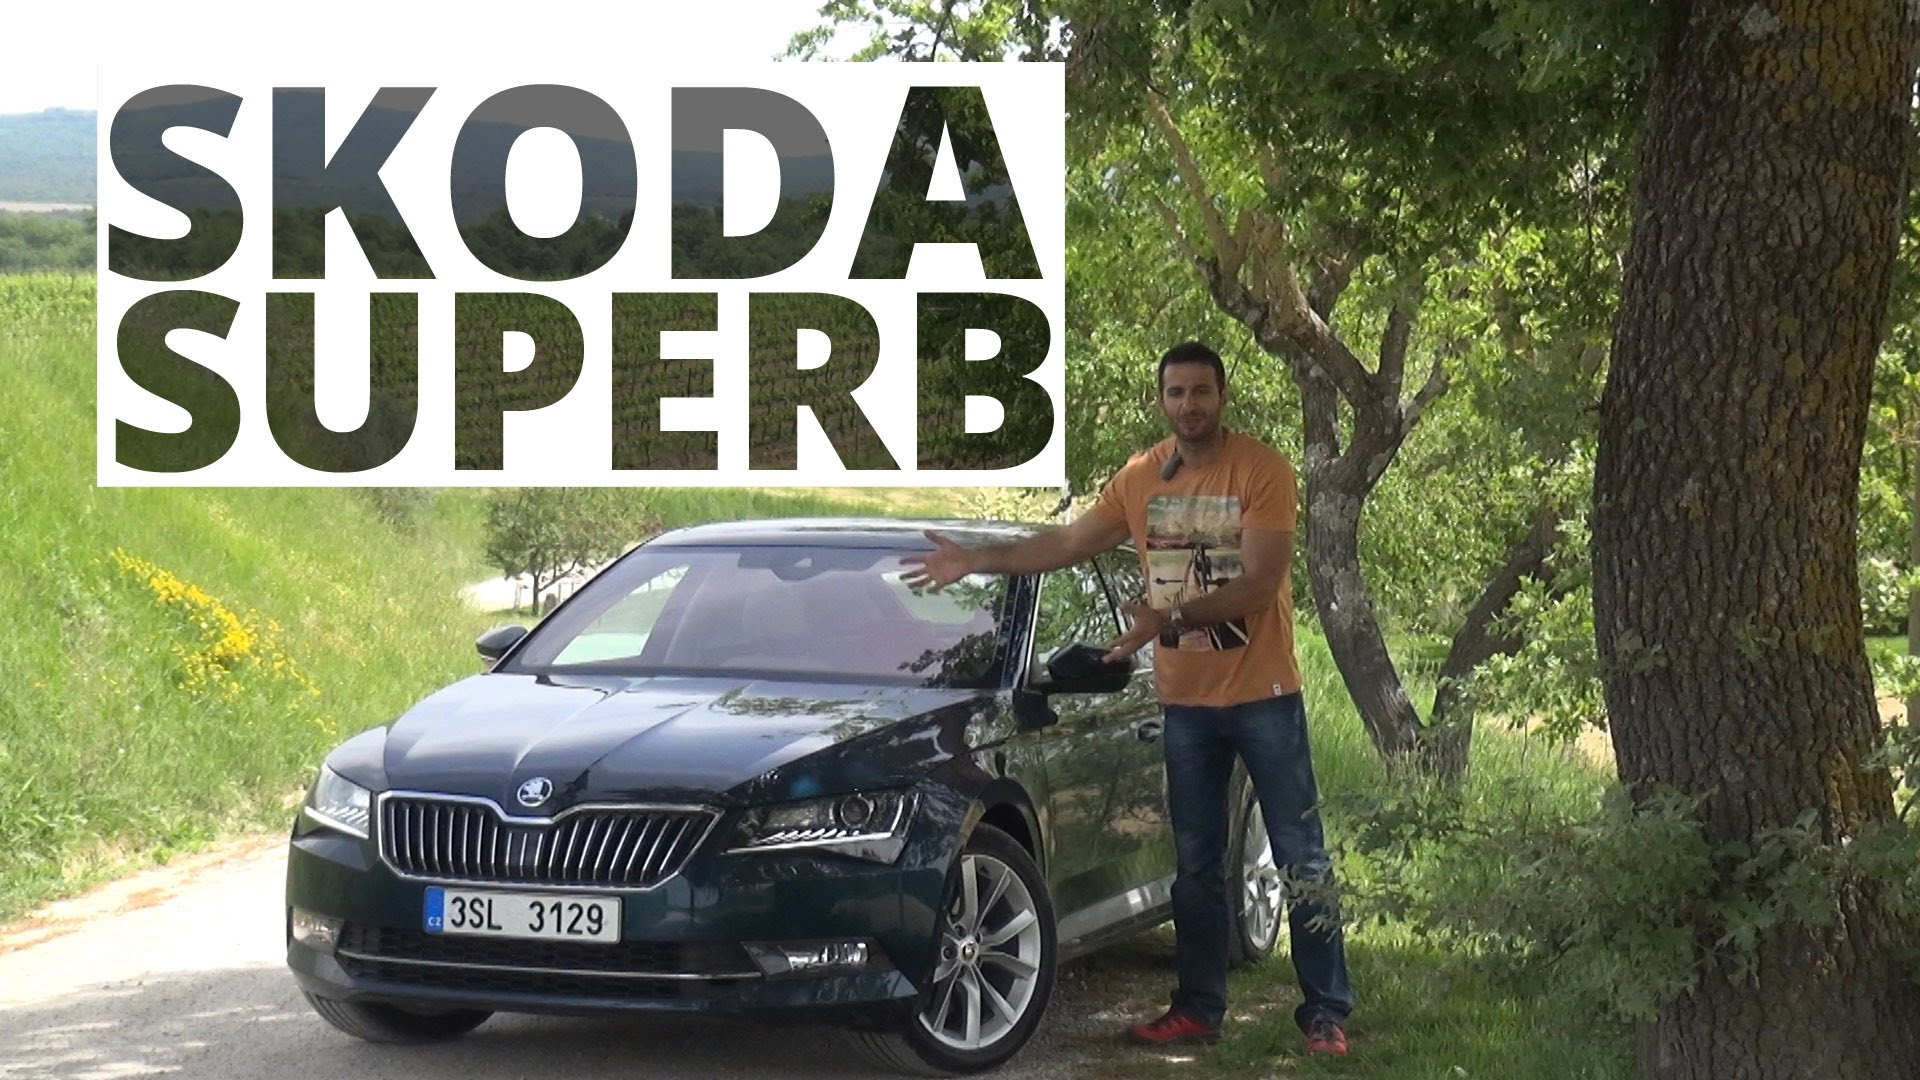 Skoda Superb, 2015 - prezentacja AutoCentrum.pl #197 - wideo w cda.pl